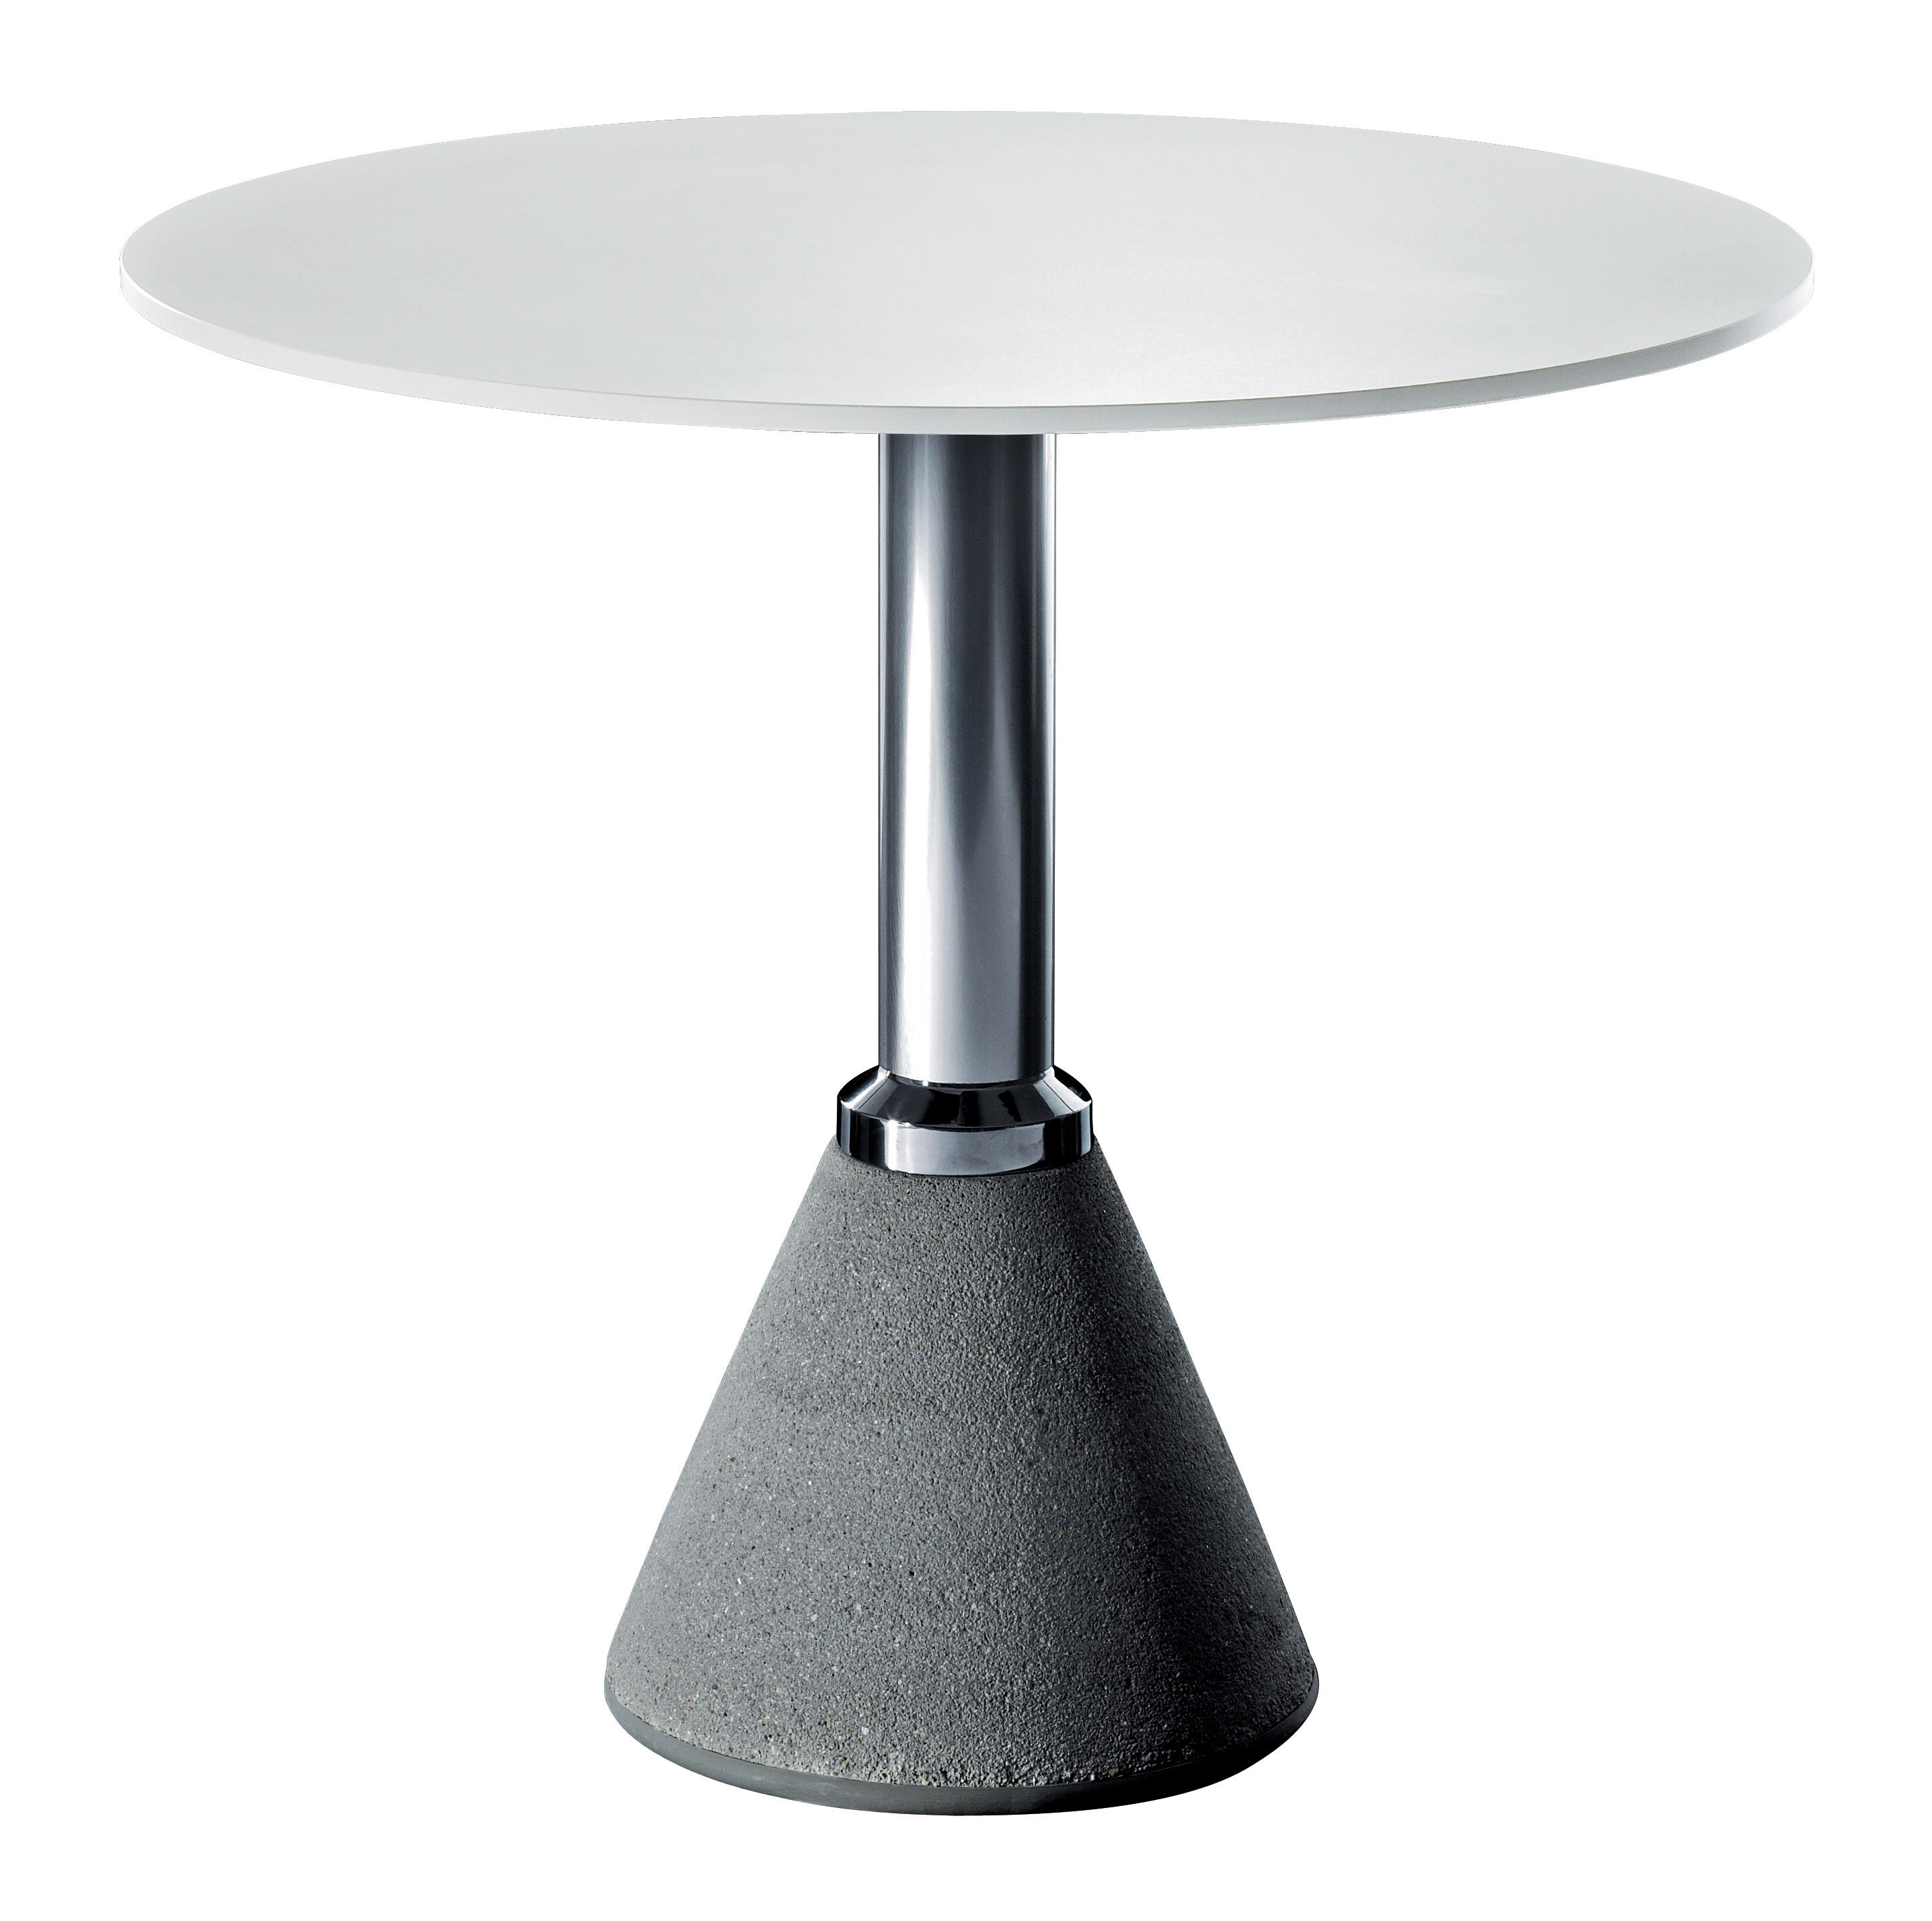 Jardin - Tables de jardin - Table ronde One Bistrot / Ø 79 cm - Magis - Blanc Ø 79 cm - Aluminium, Béton, HPL